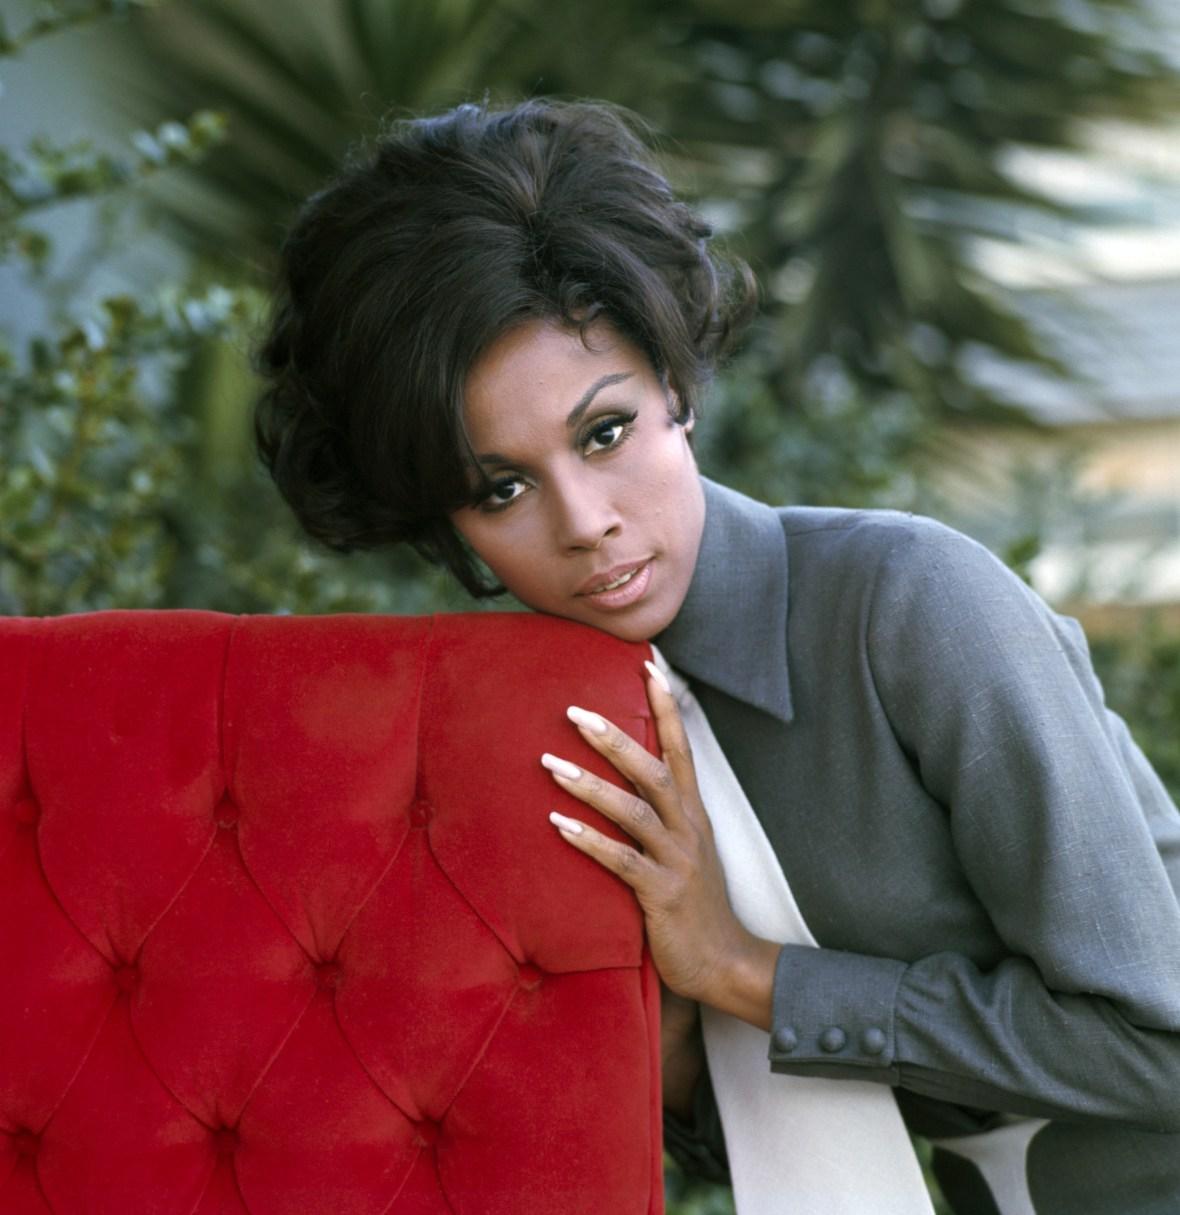 Diahann Carroll in a Promo Image for 'Julia' (1968-1971)